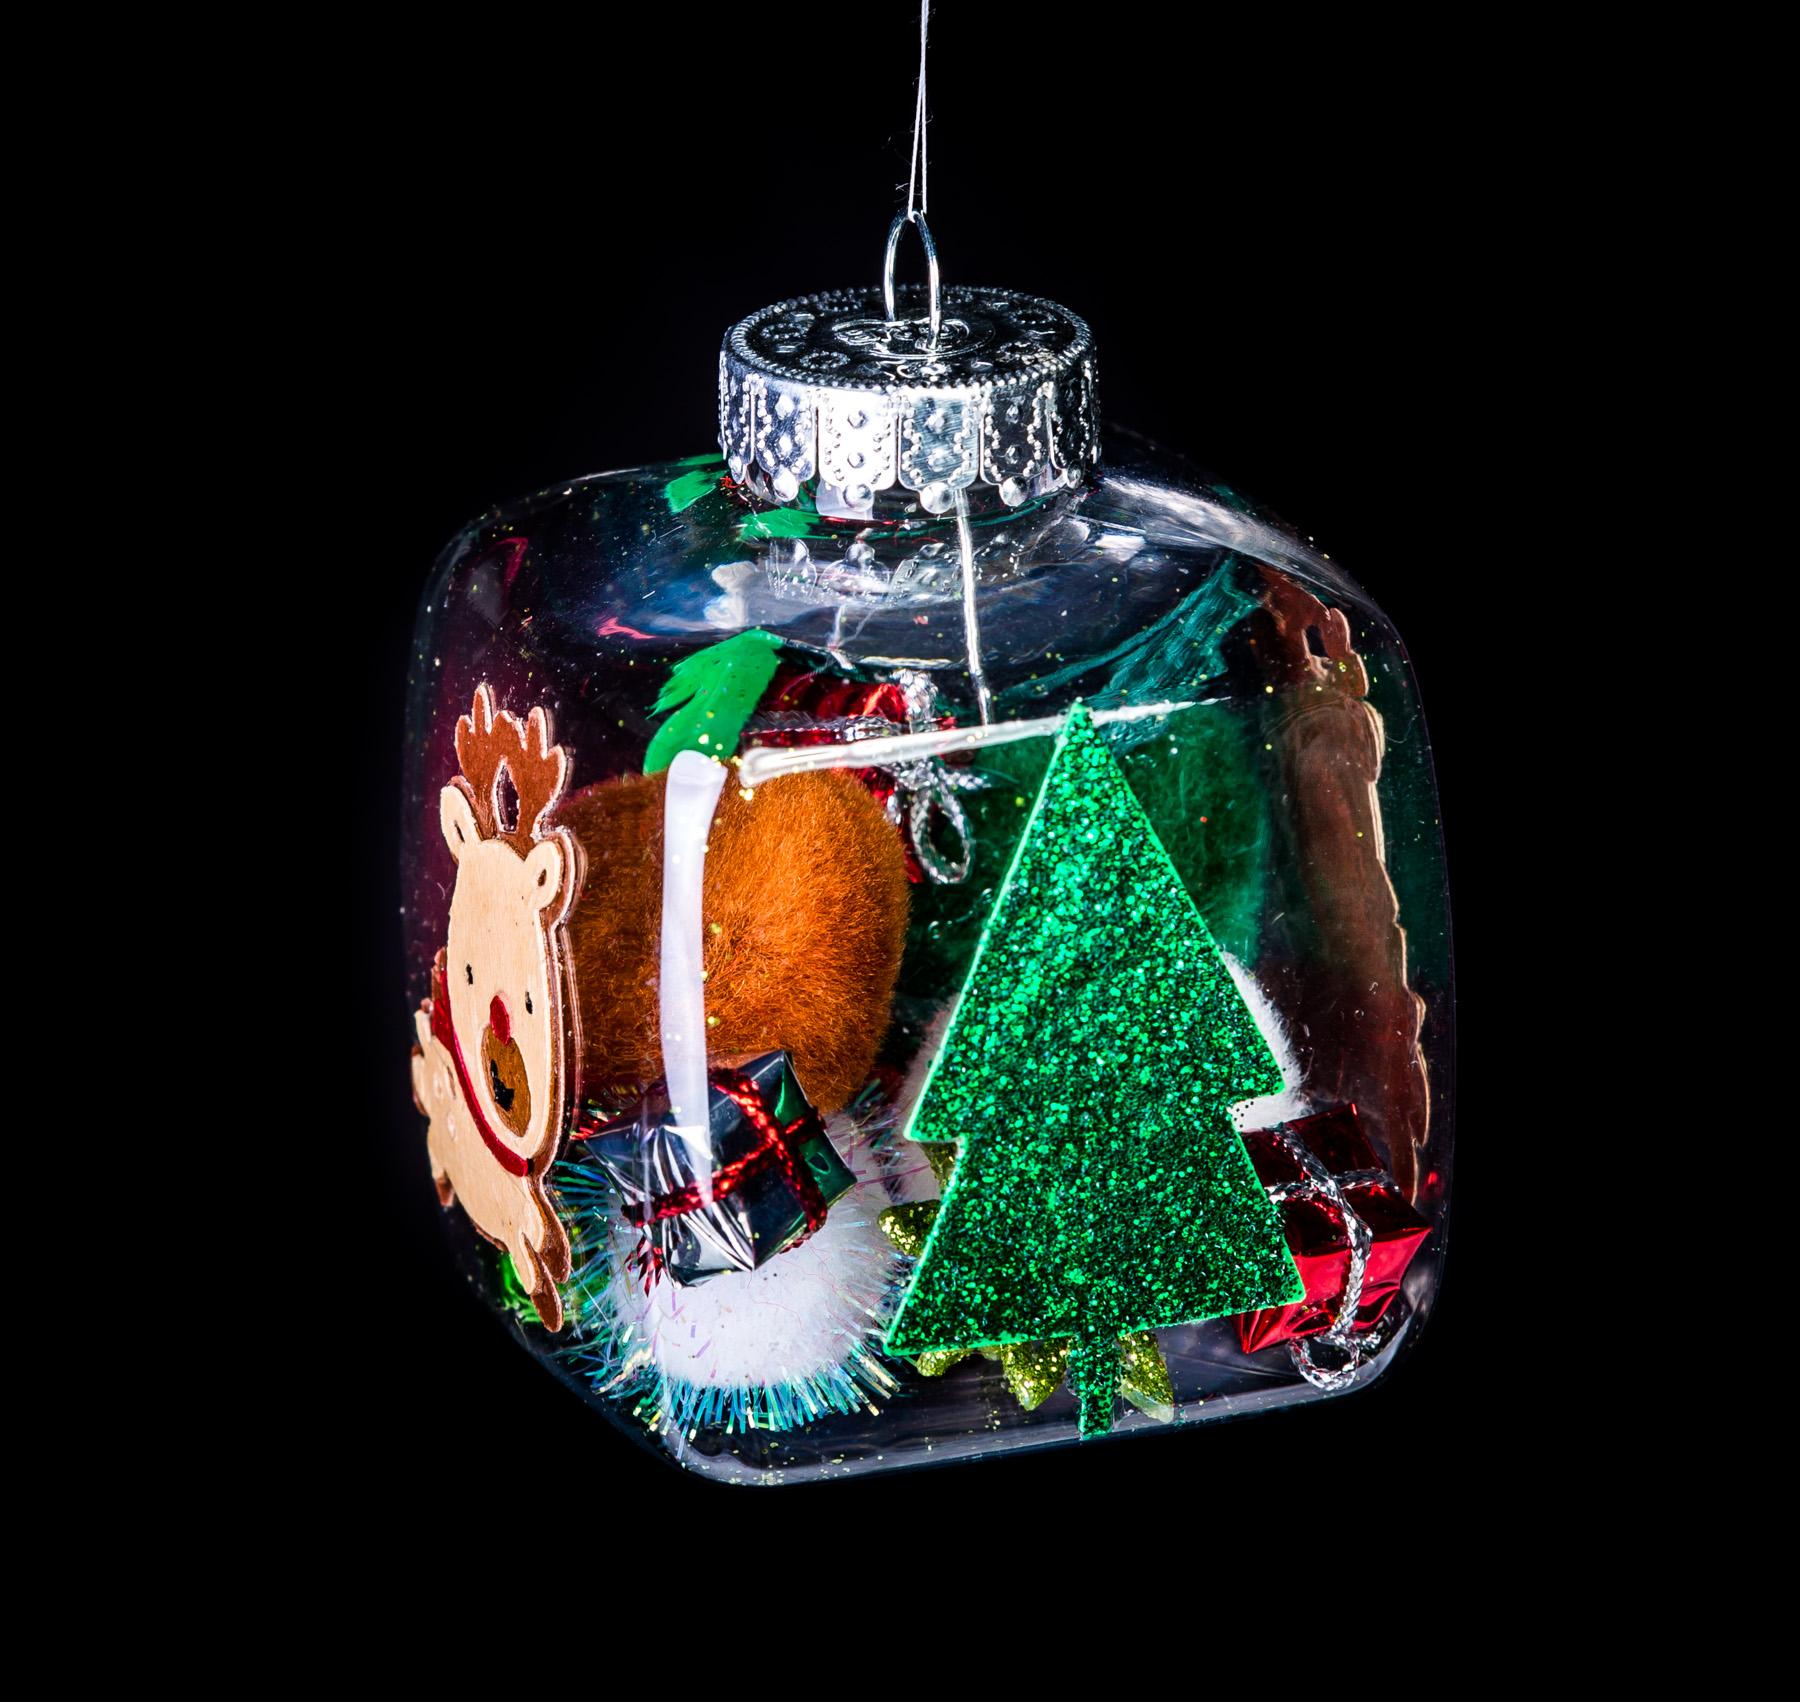 Newest Christmas Decorations 2013: Reindeer